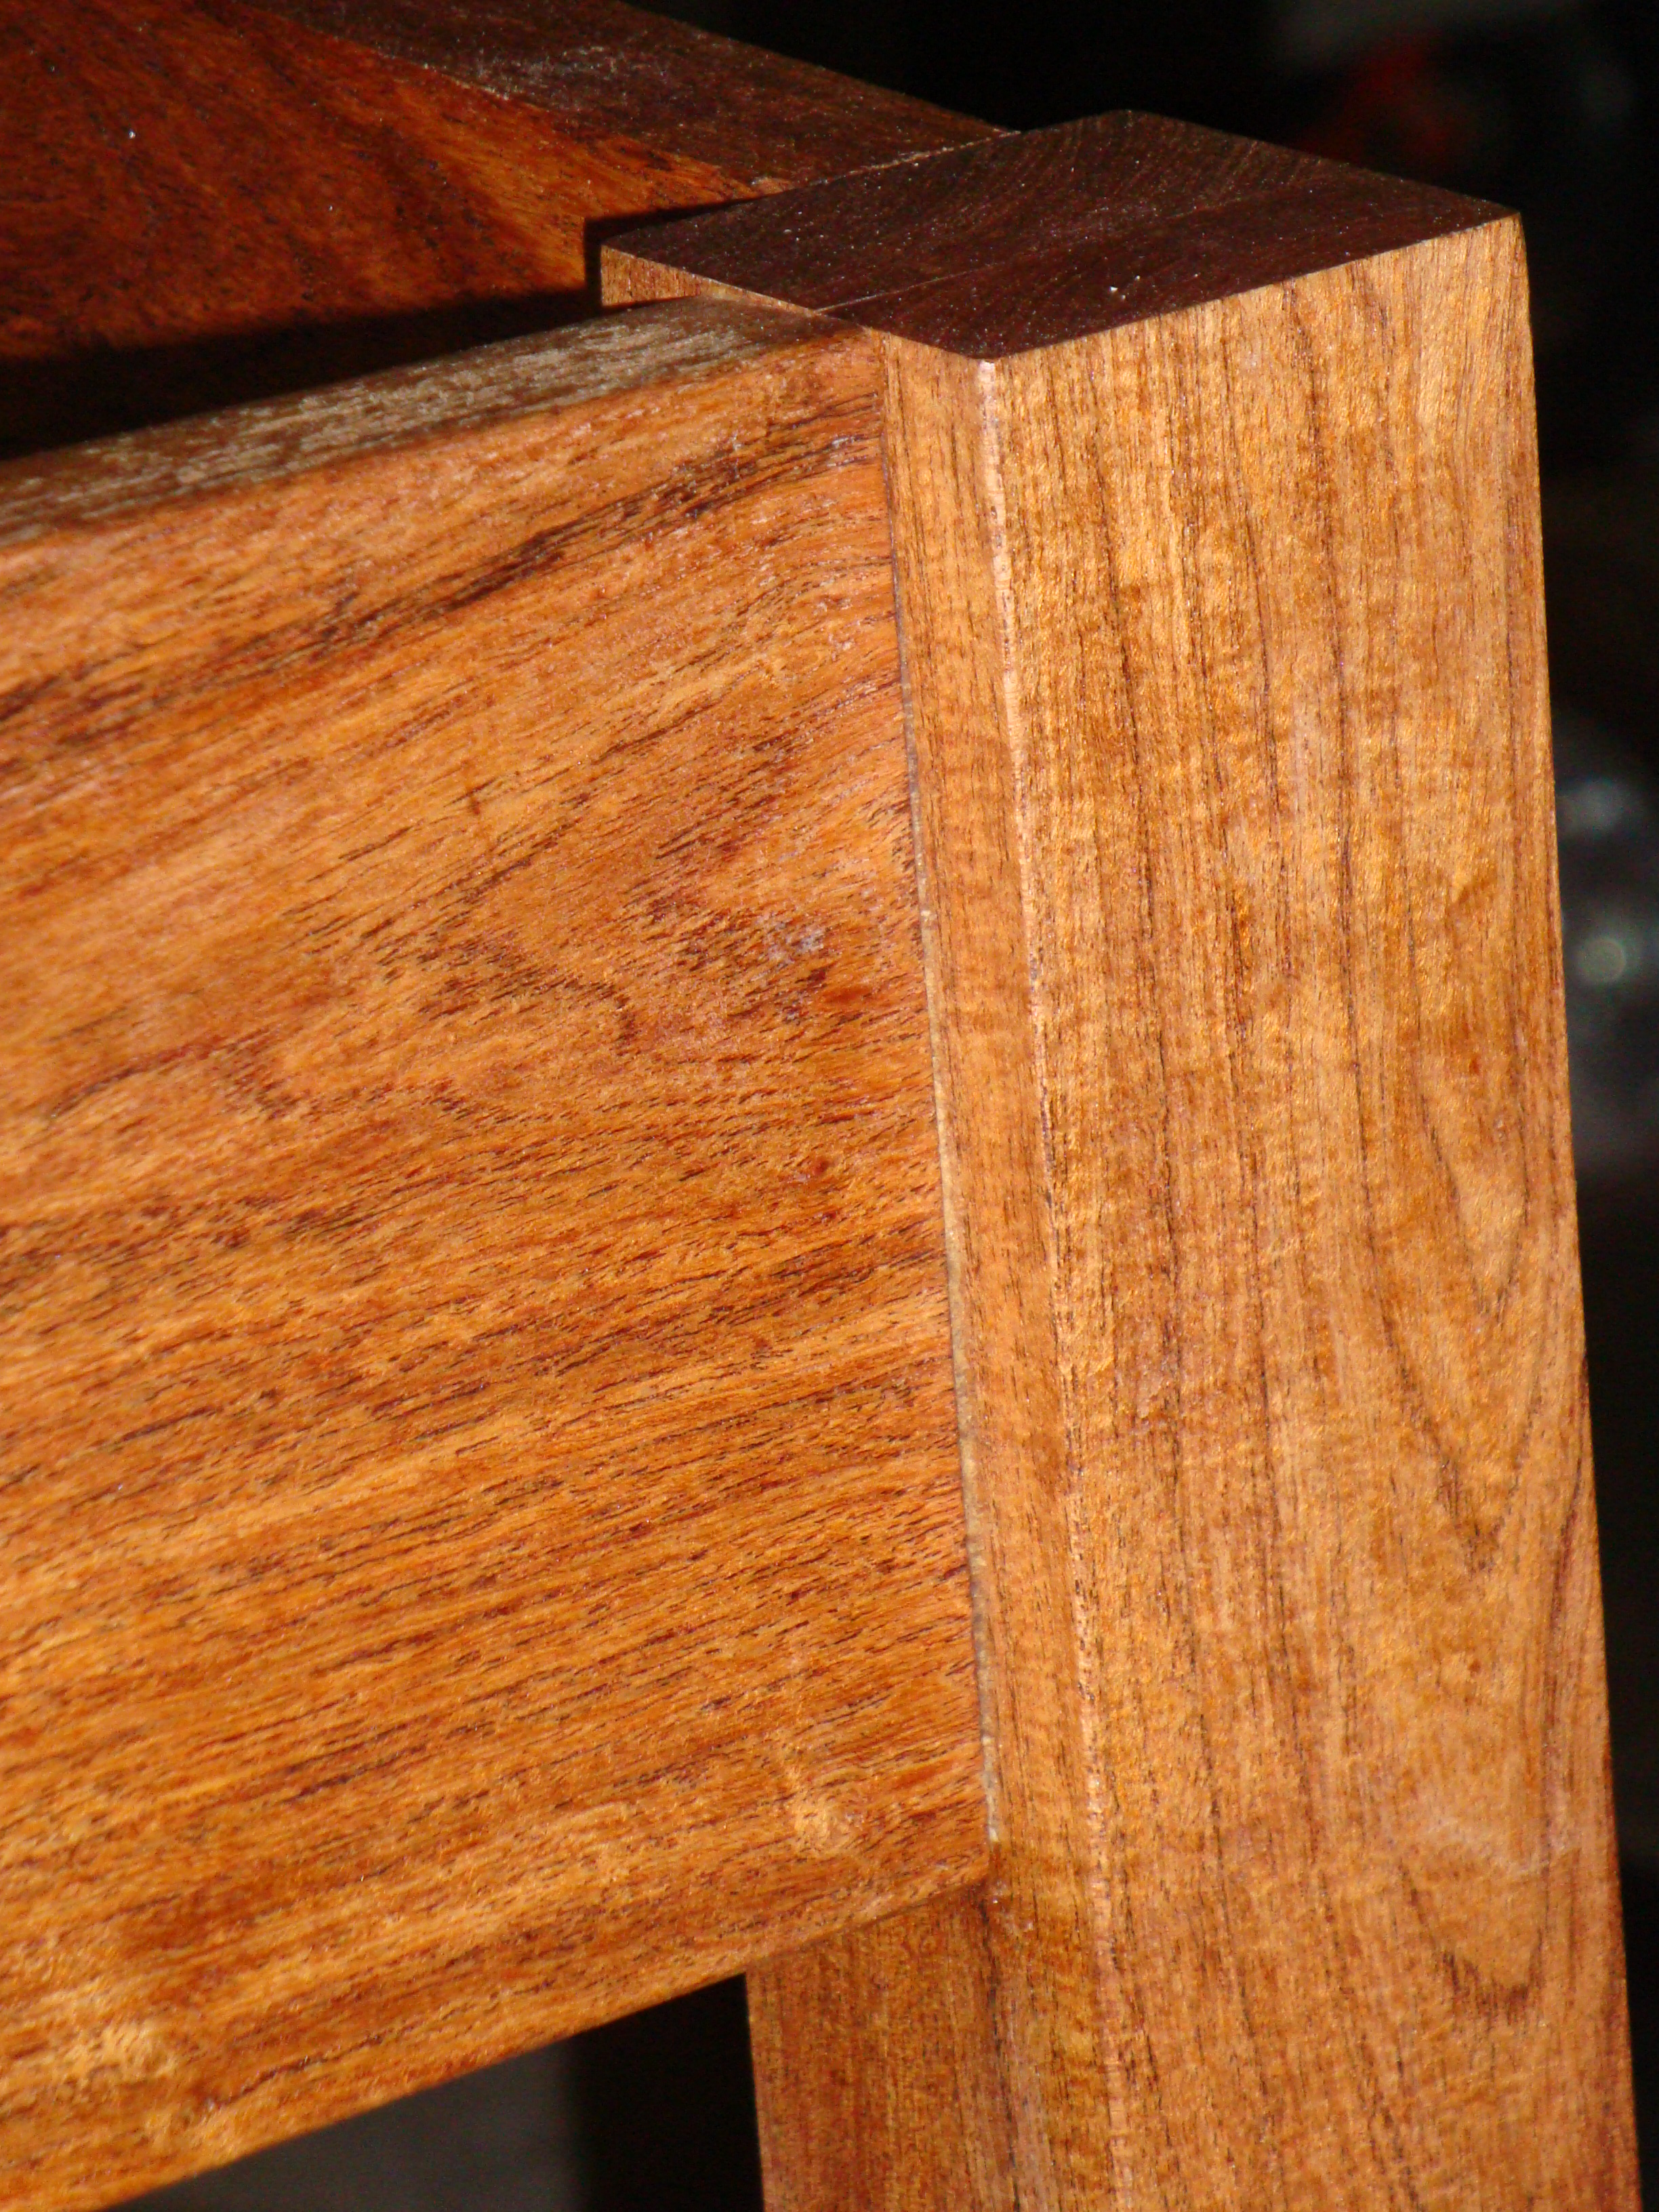 Deft honey oak wood stain Plans DIY How to Make | six03qkh